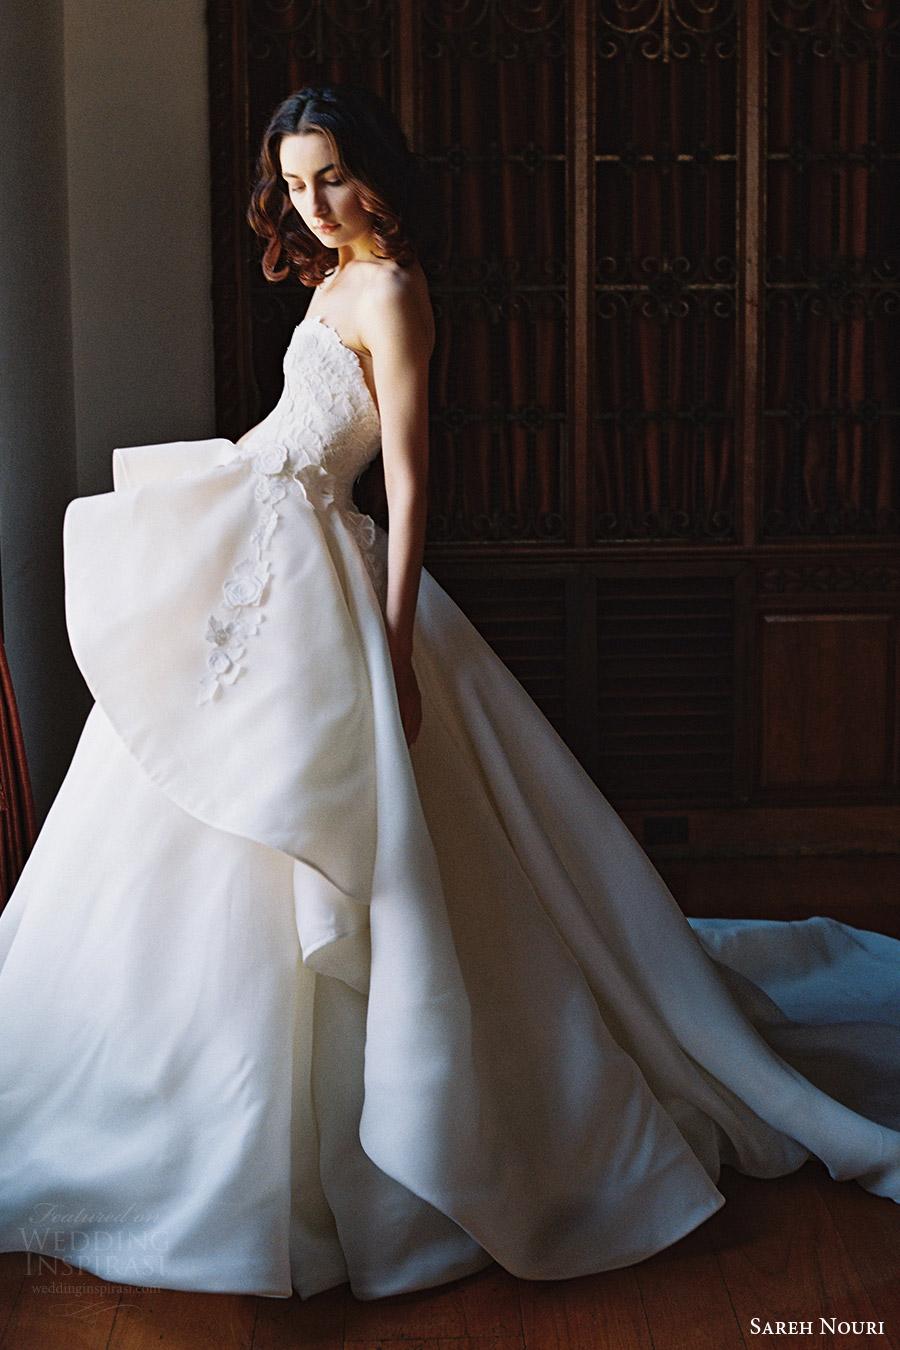 sareh nouri bridal spring 2017 strapless sweetheart ball gown wedding dress (dahlia) svtrain